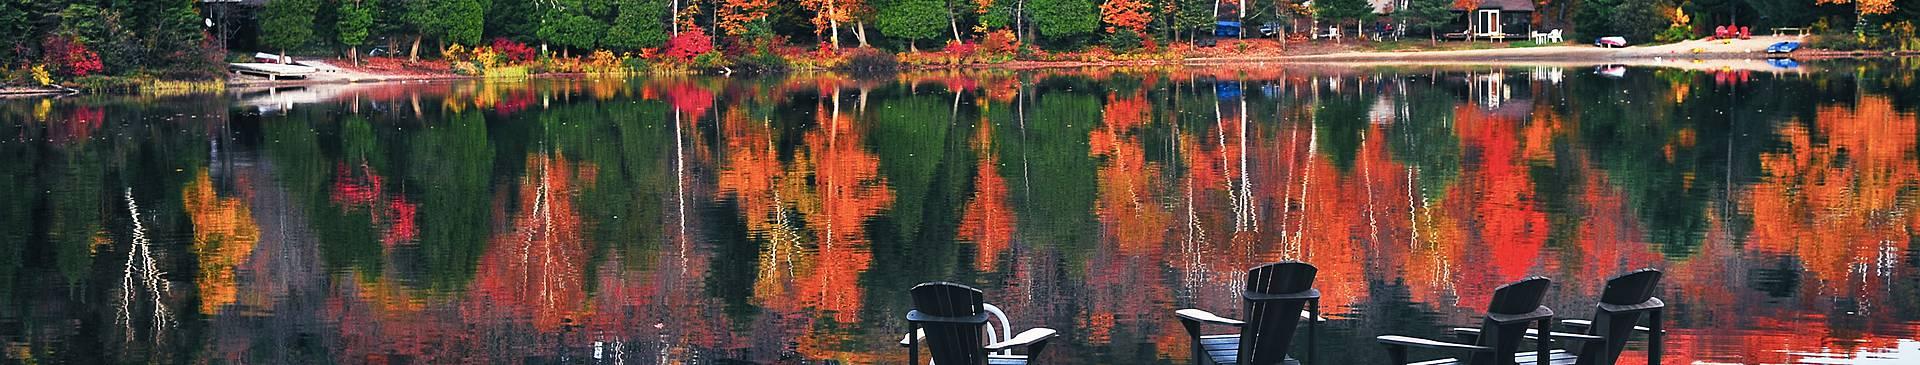 Viajes a Canadá en otoño